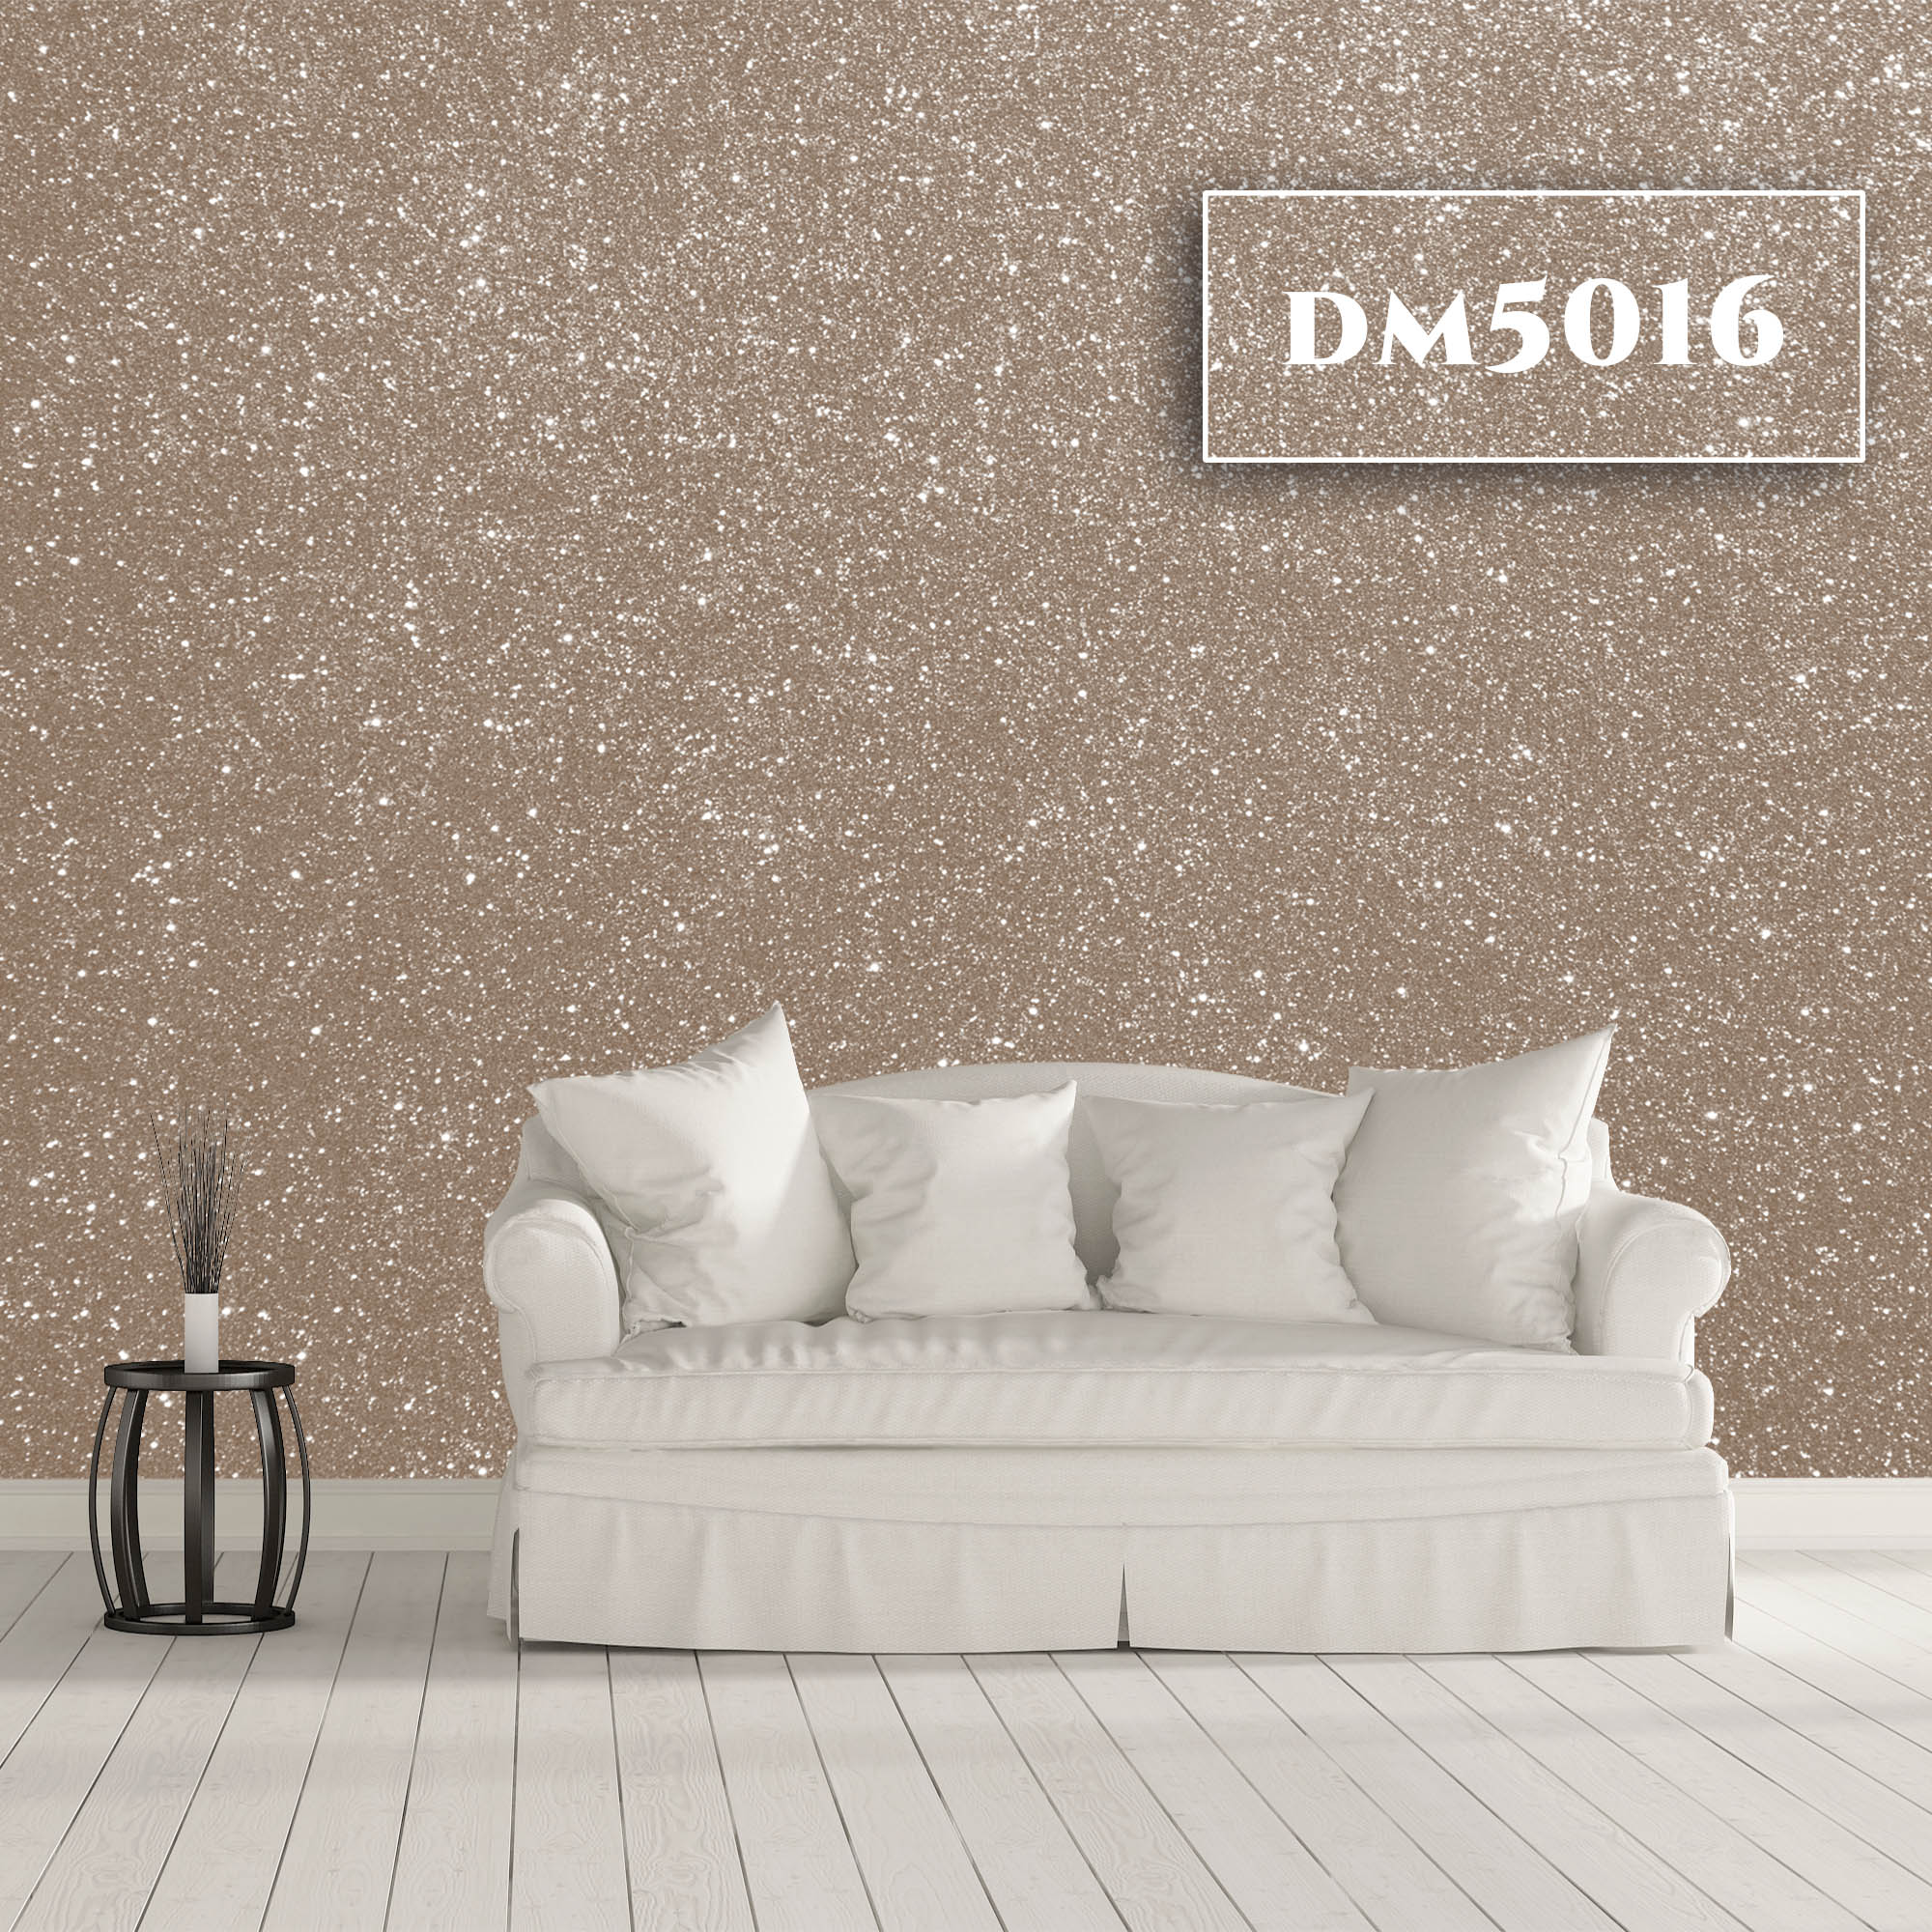 DM5016